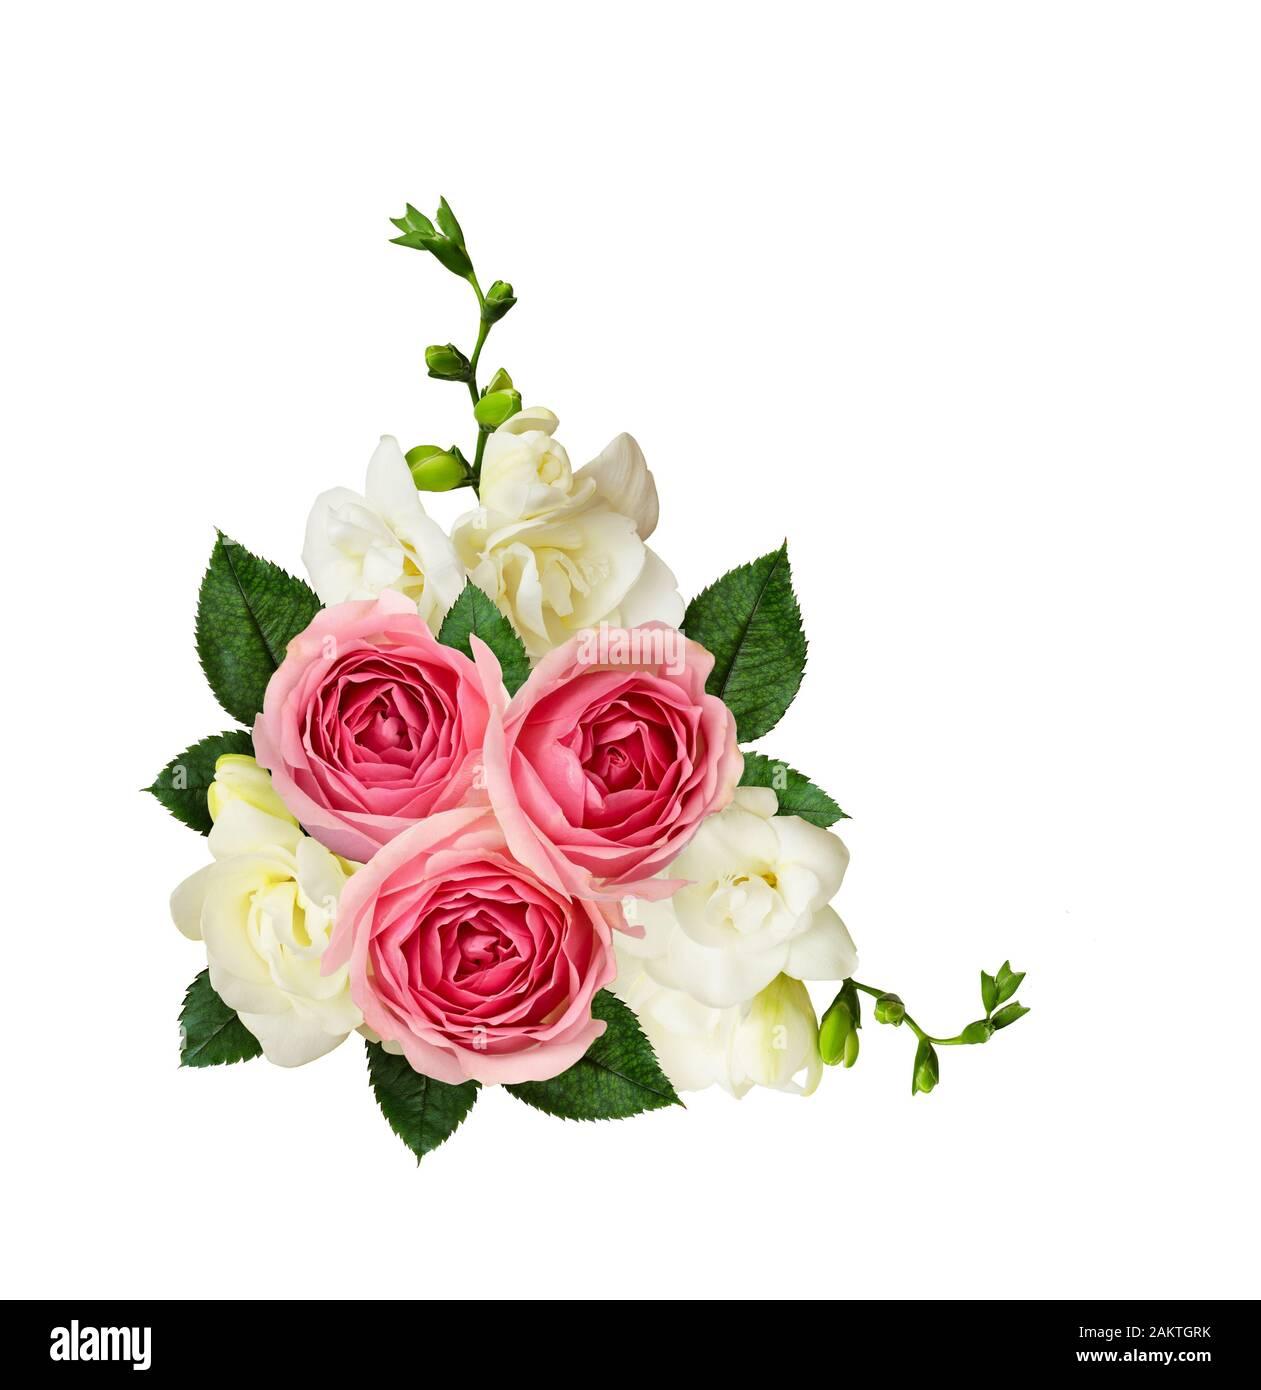 25 PEACHY CREAM FLAT ROSEBUDS 25 PEACH//WHITE ROSES COLLECTION